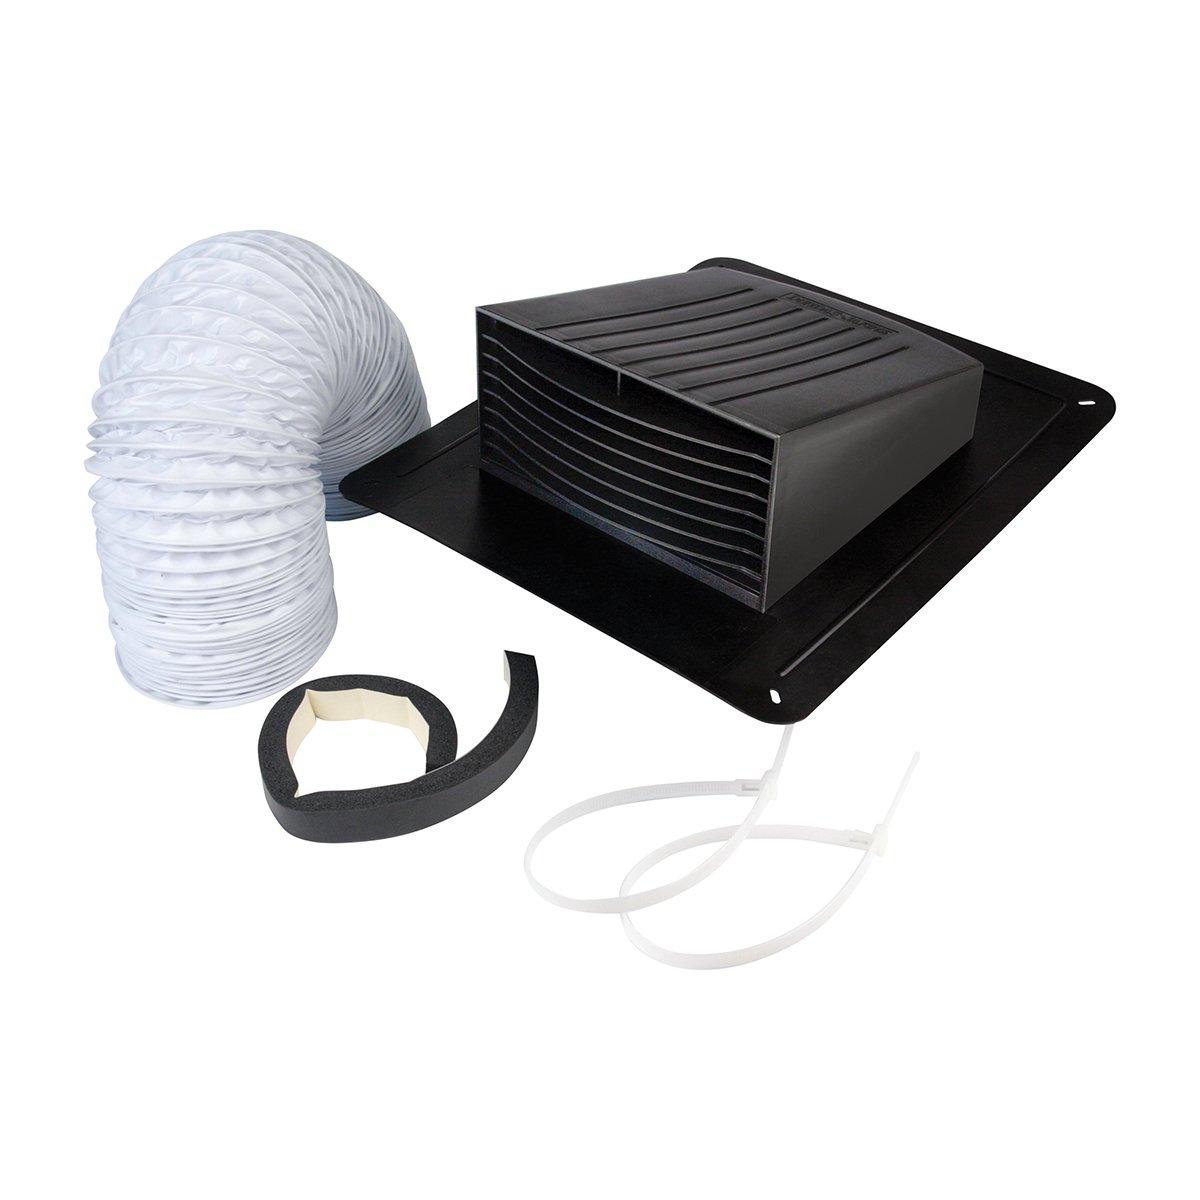 Dundas Jafine EXRT Bathroom Fan Vent Kit - Roof Style, 4''